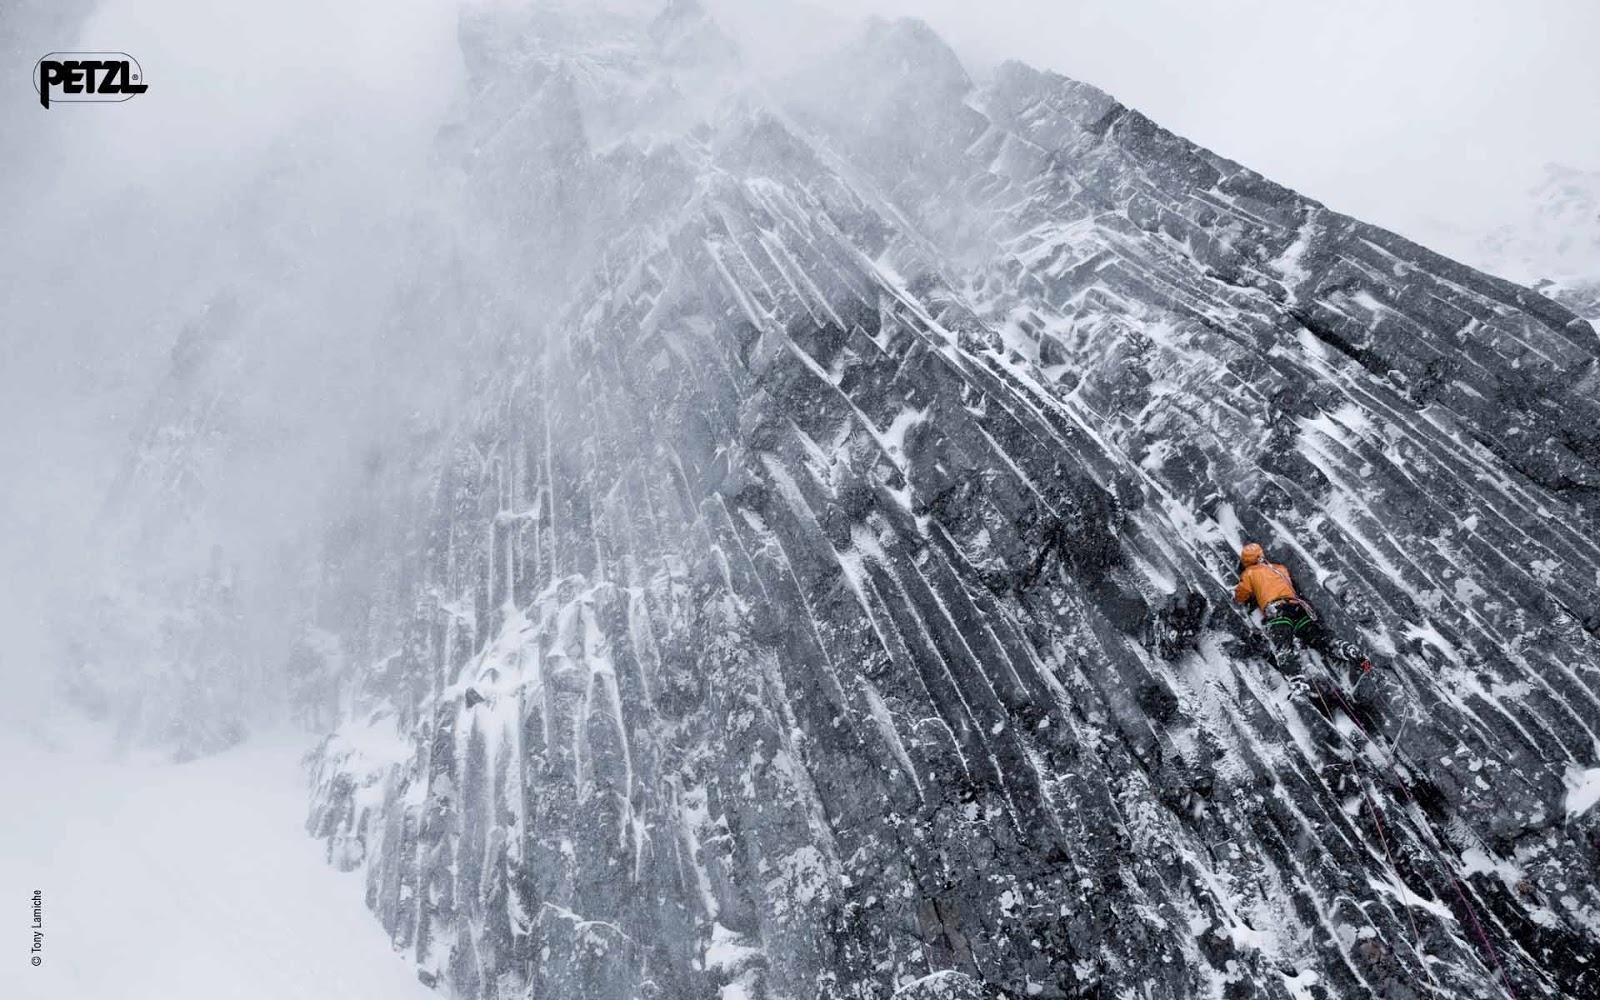 HD Wallpapers: Climbing Wallpapers